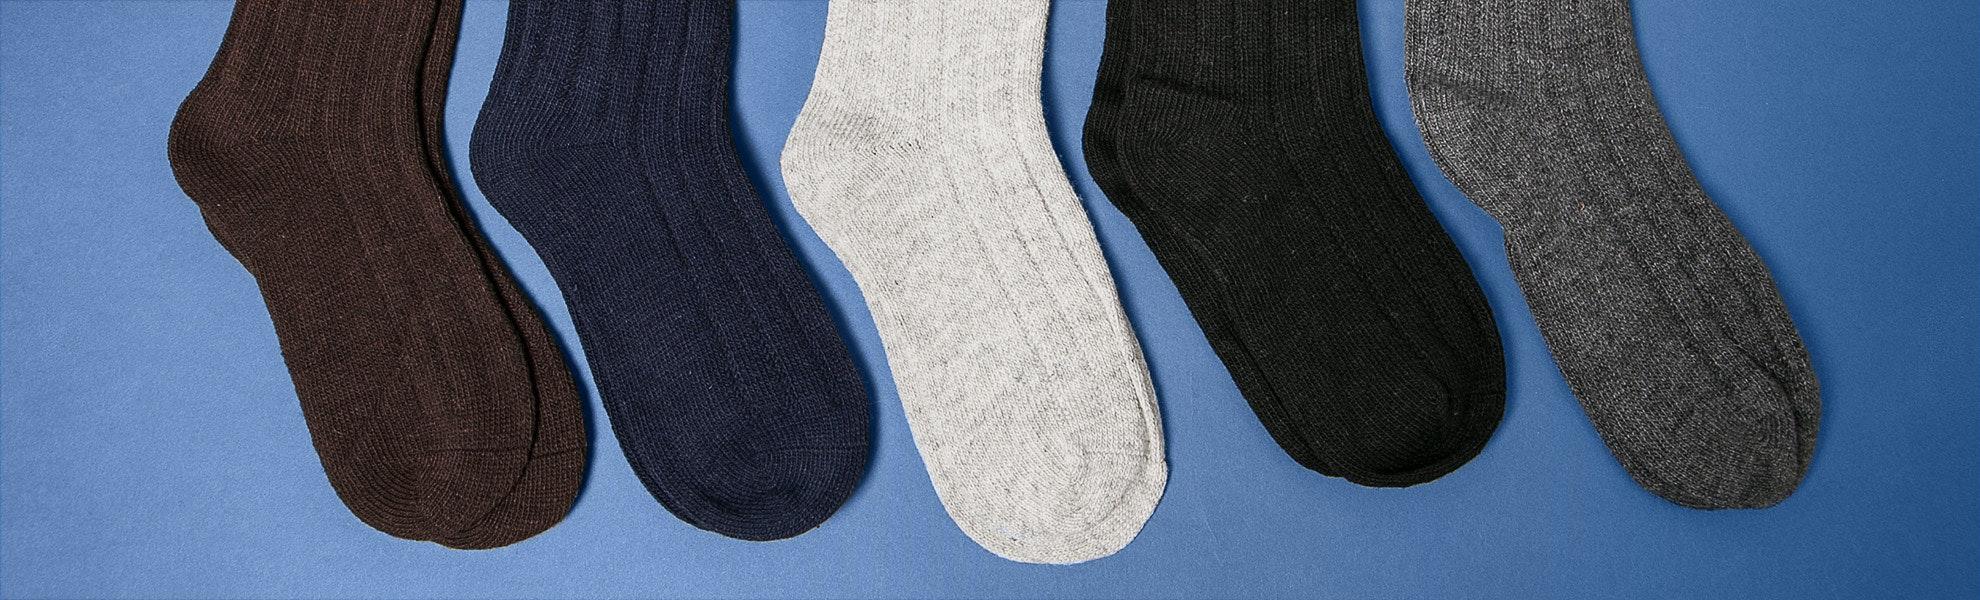 Socksquare Wool Socks (5-Pack)